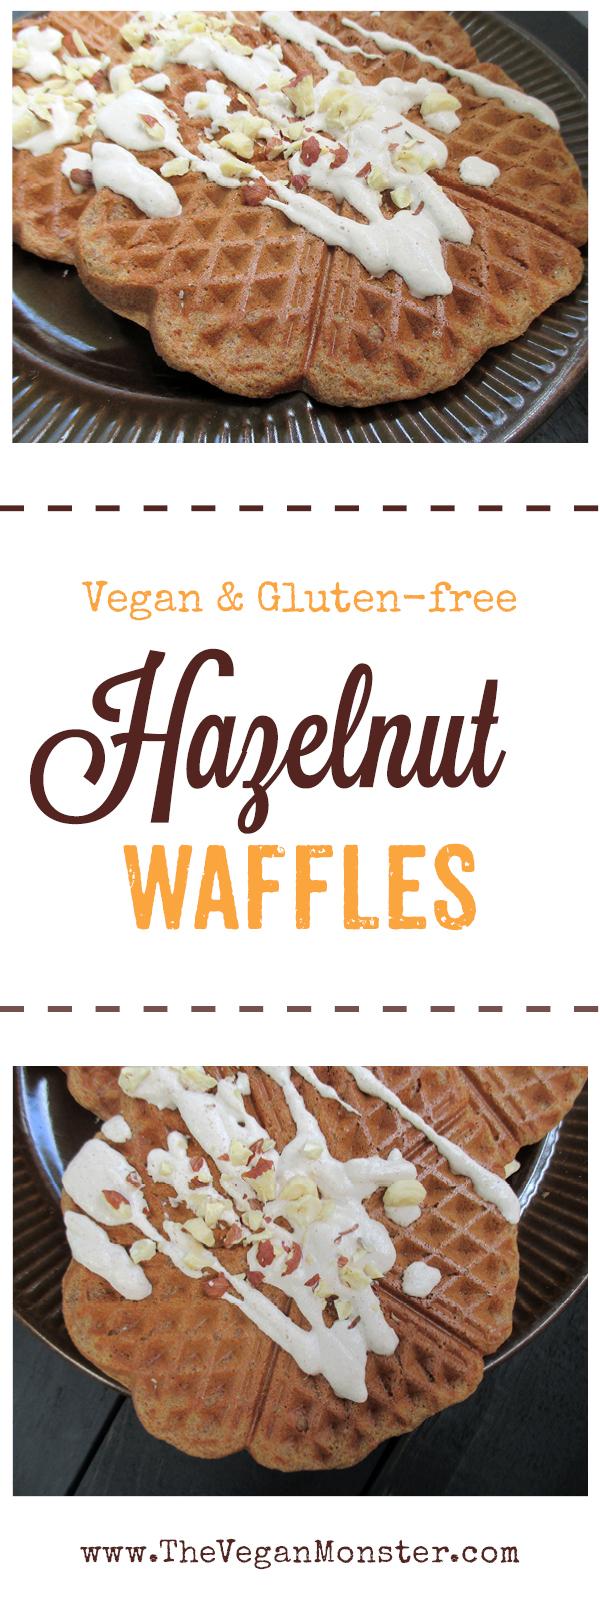 Vegan Gluten-free Hazelnut Waffles Recipe